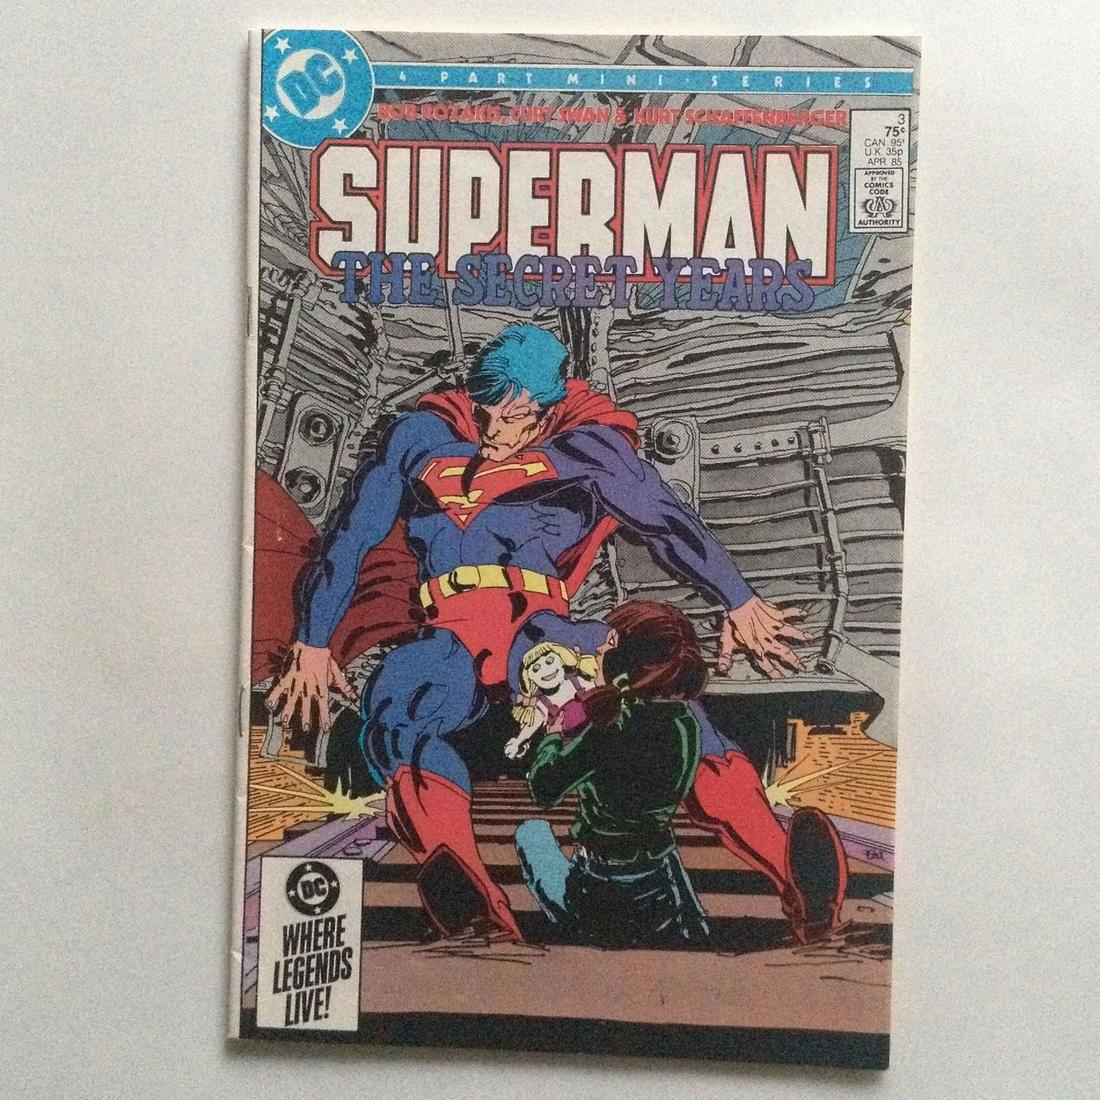 SUPERMAN THE SECRET YEARS #3 1985 comic book DC